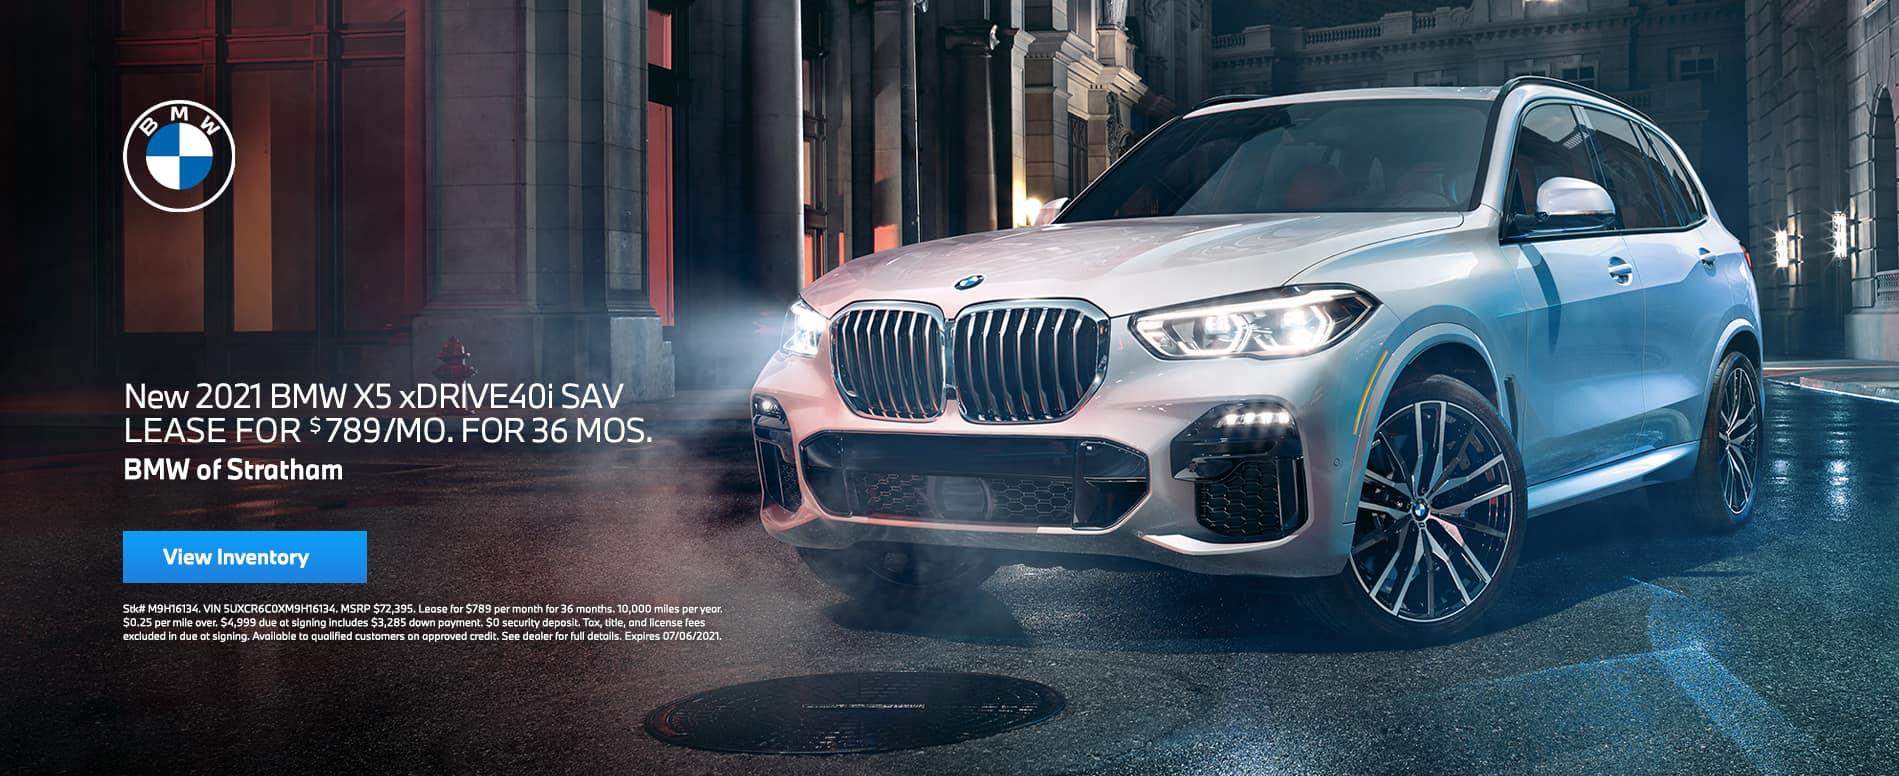 BMWStratham_Slide_1990x776_X5xDrive40i_06-21